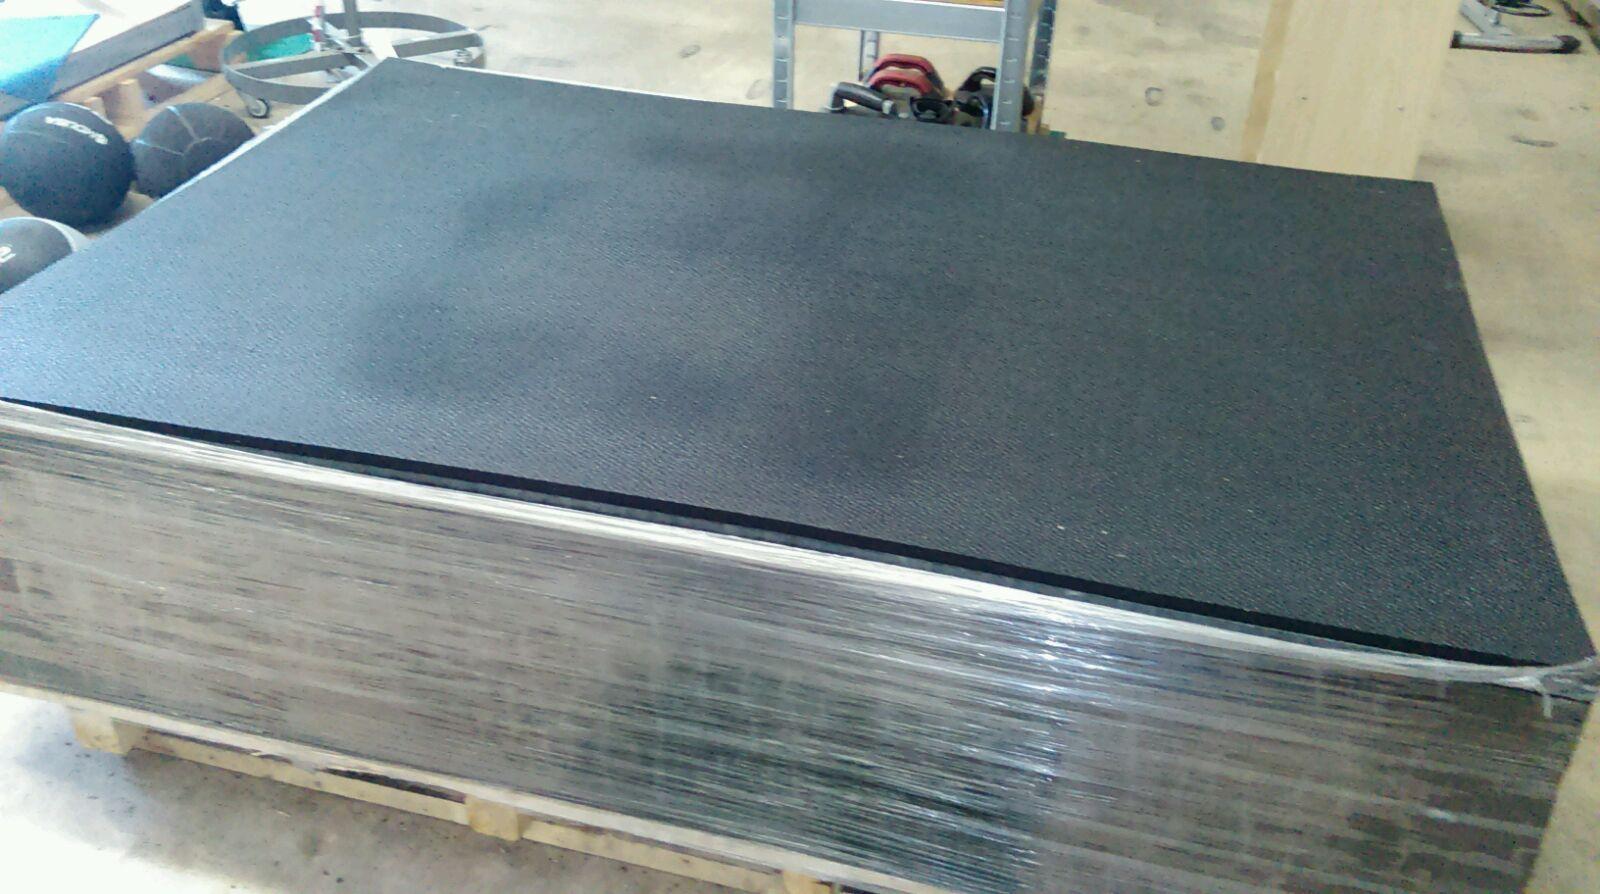 Garage Floor Tiles From Rubber Flooring Inc Images